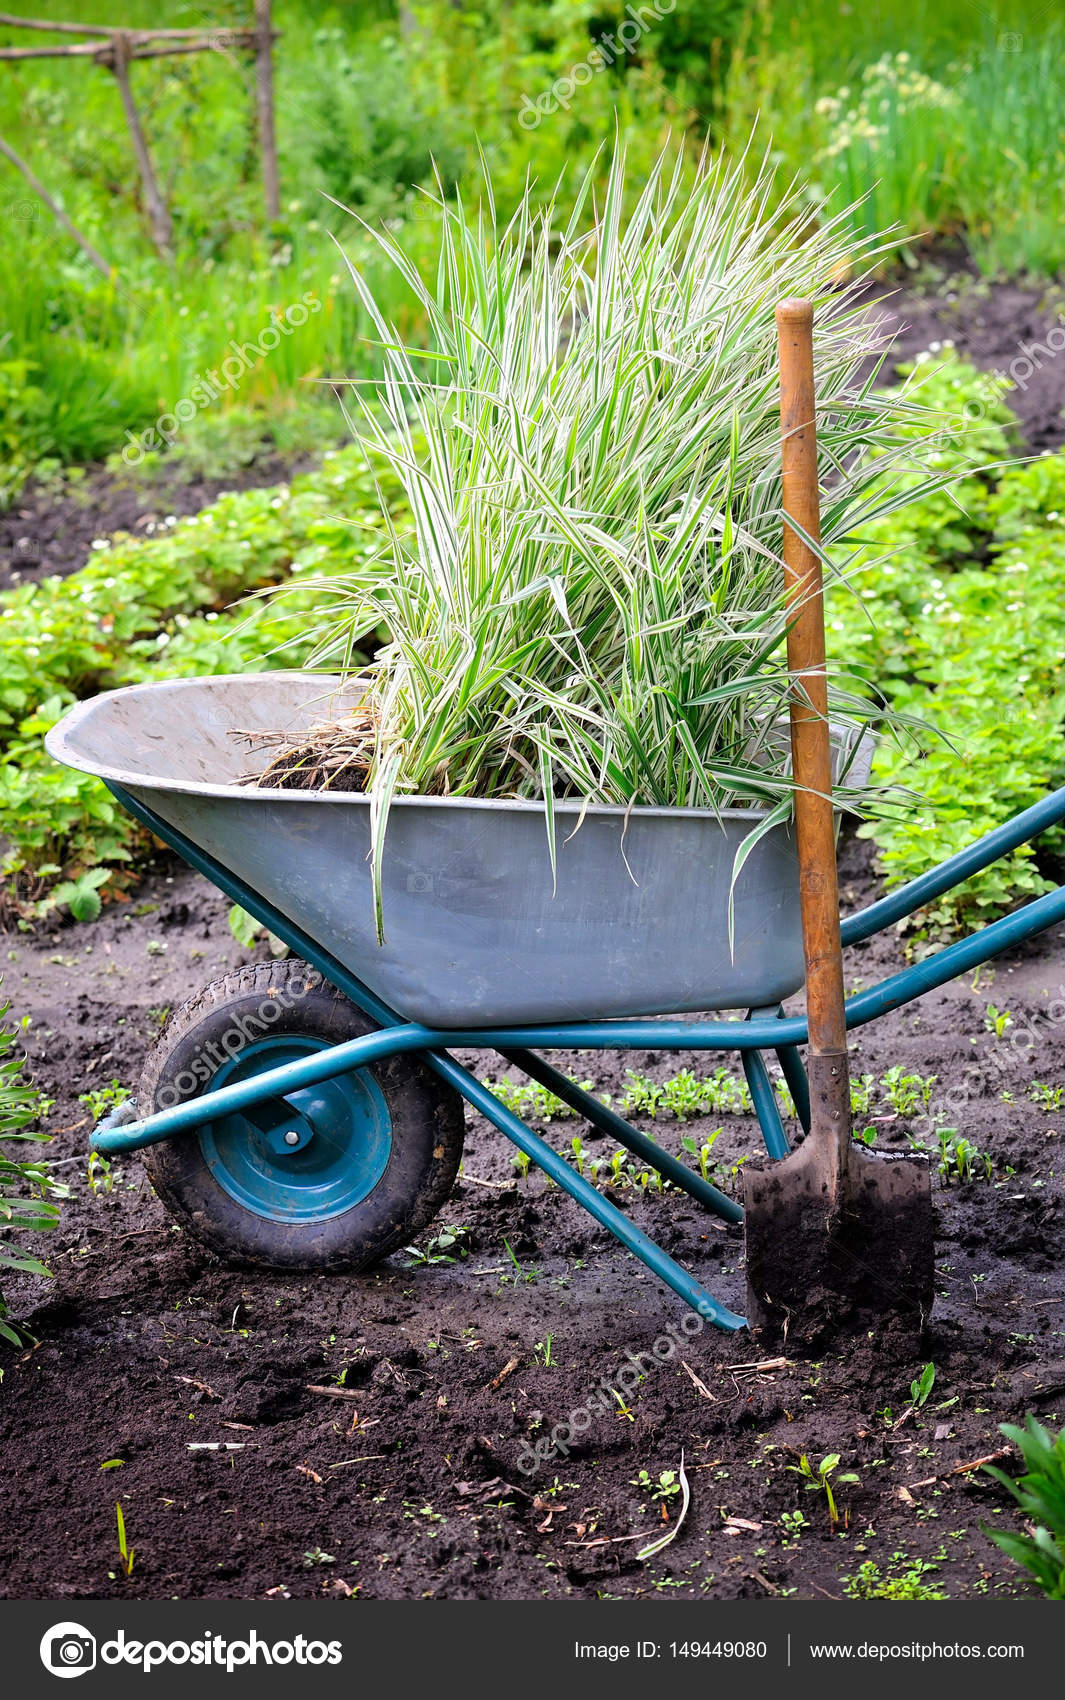 Wheelbarrow full with decorative sedges (Reed canary grass) and ...